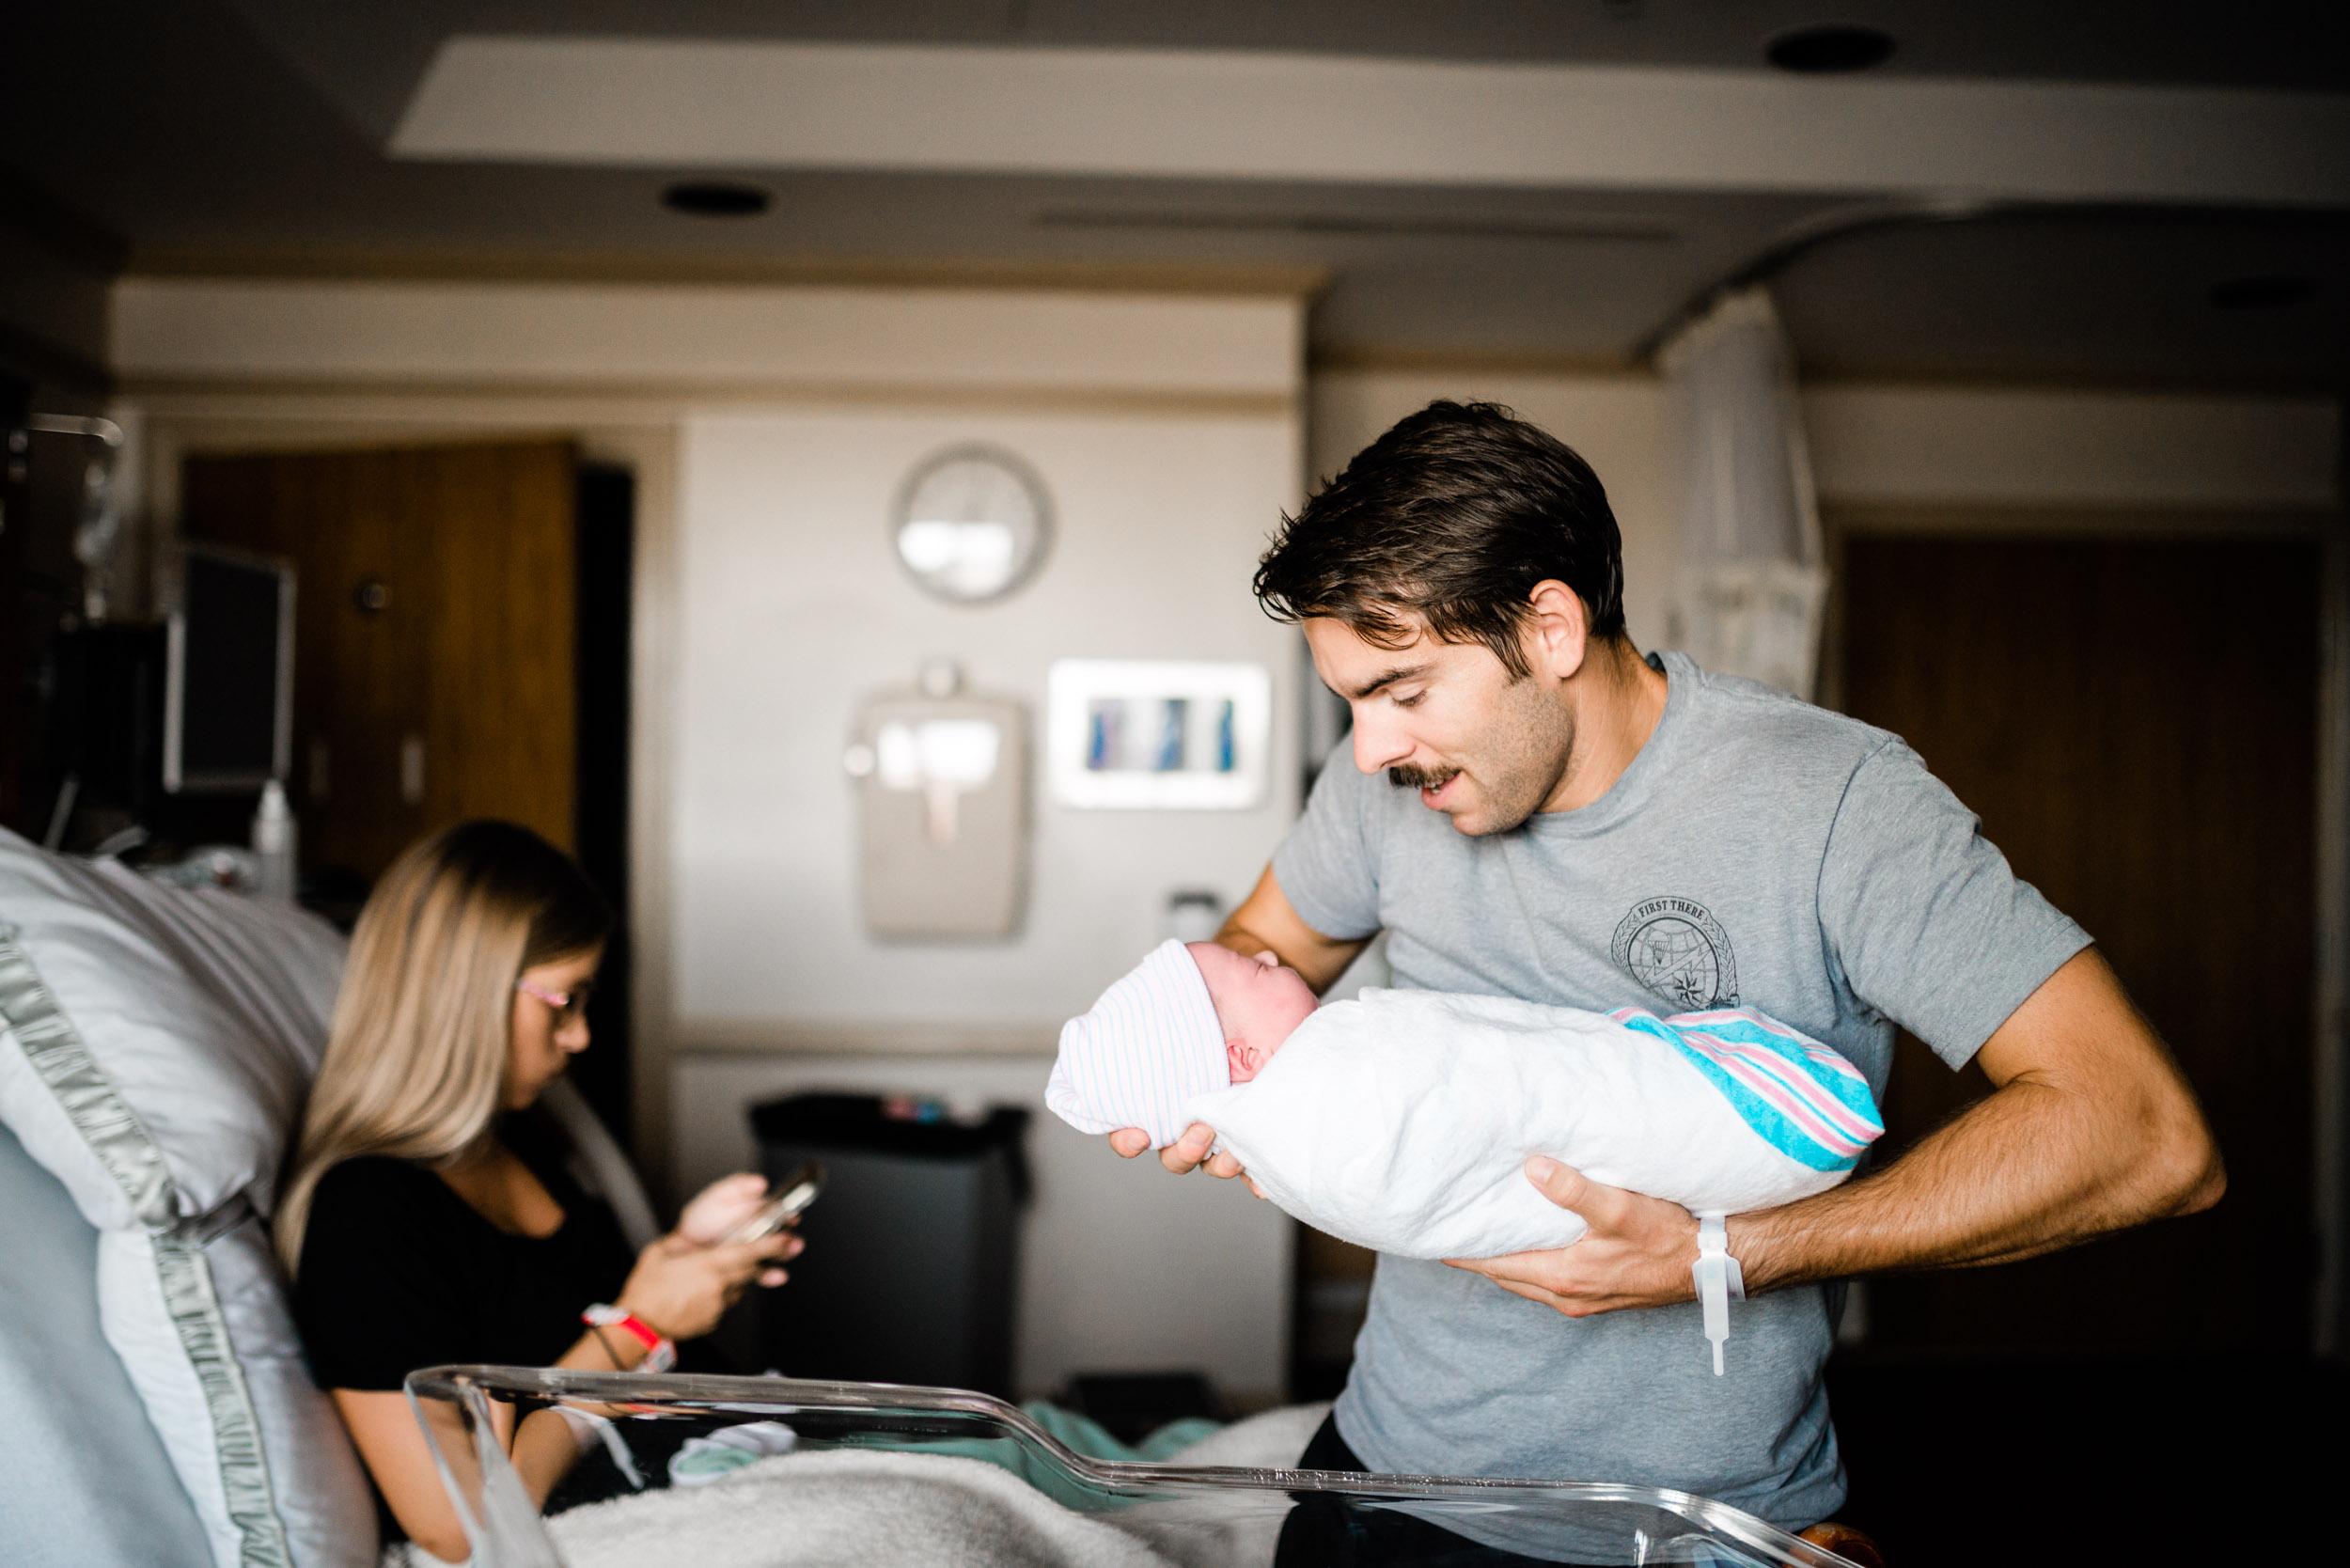 north-okaloosa-medical-center-birth